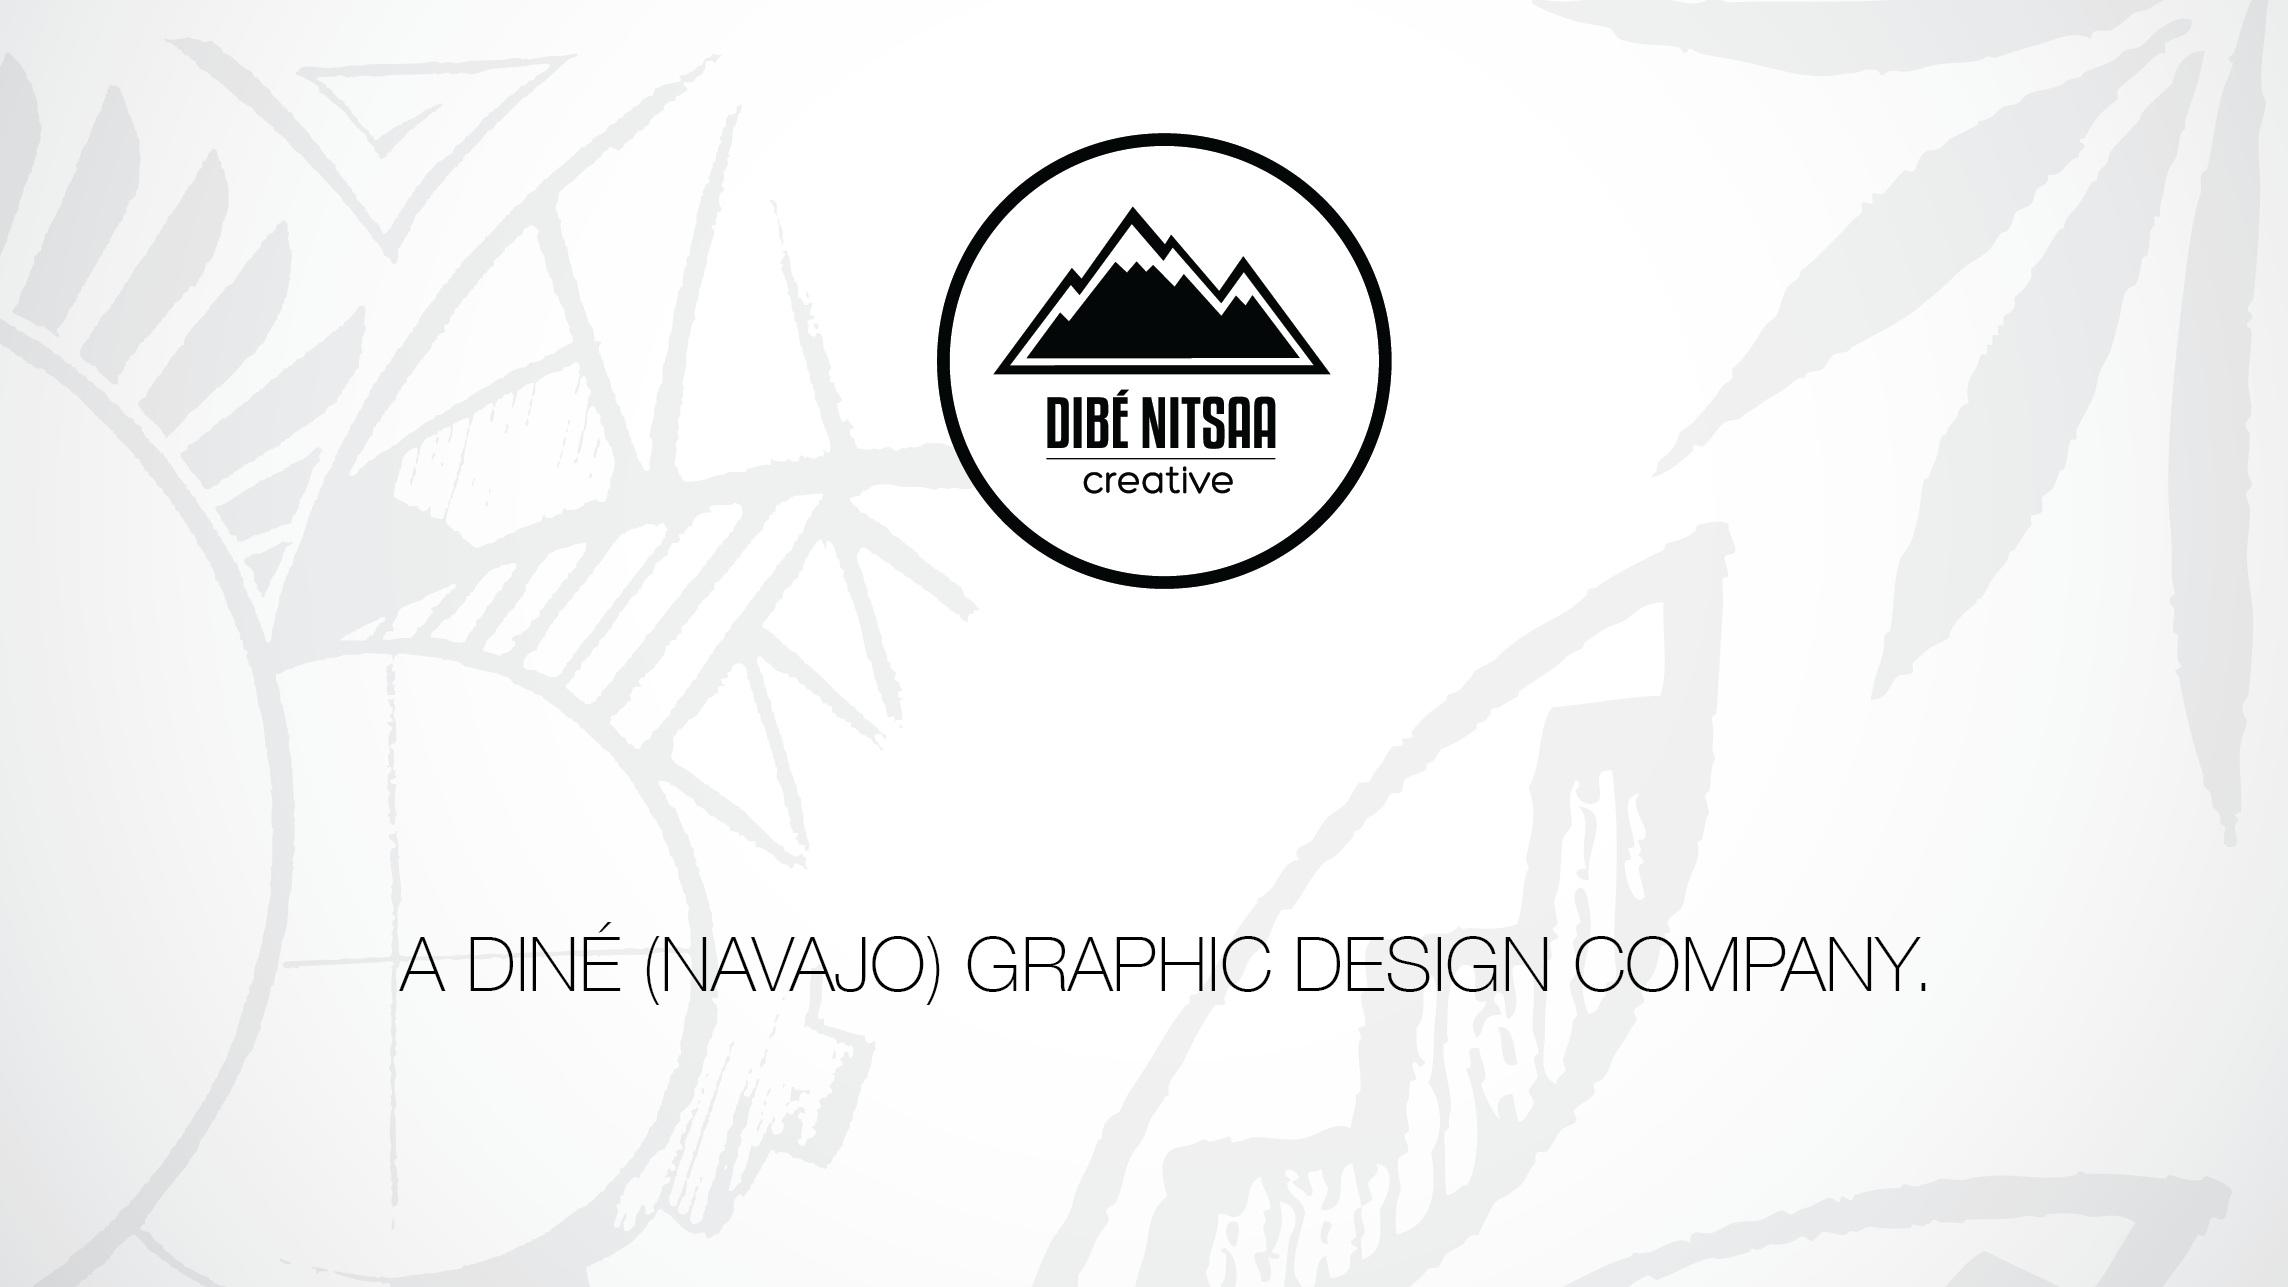 dnc_layout-01.jpg